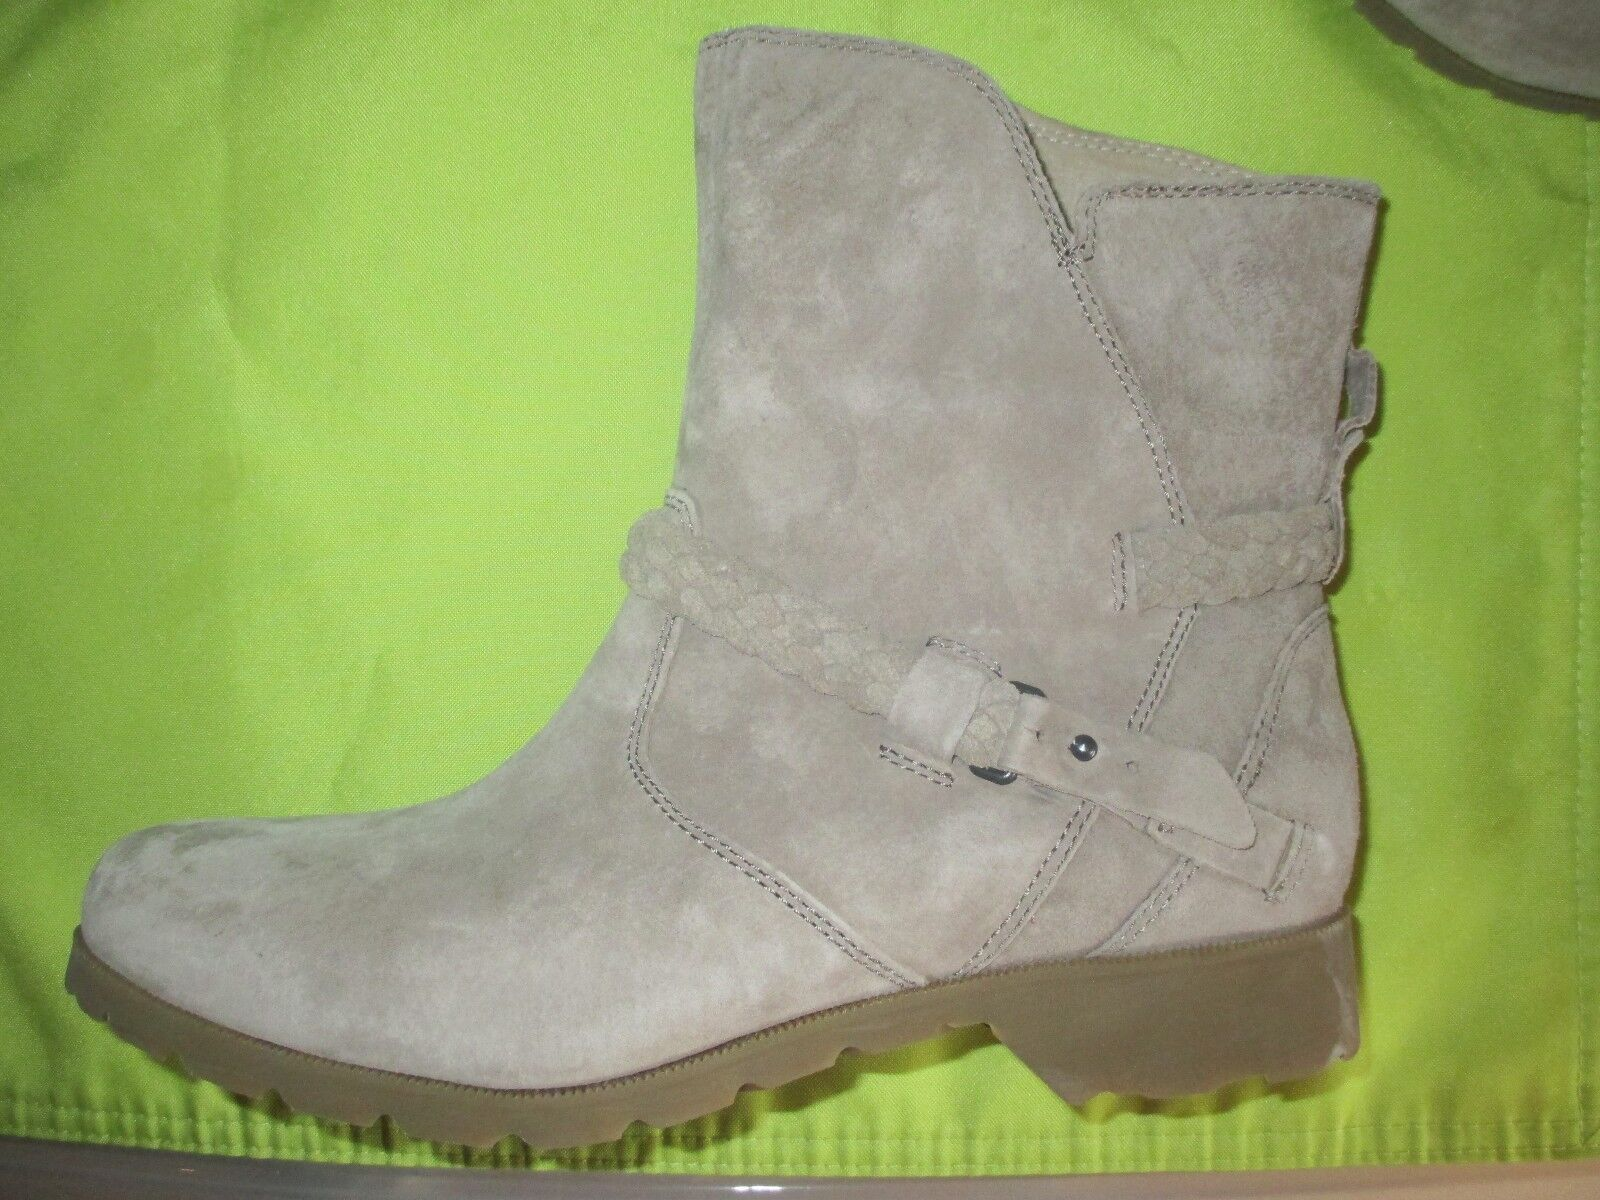 NEU TEVA Delavina ANKLE BOOTS Schuhe LEATHER 9.5 120 Retail Tan Suede